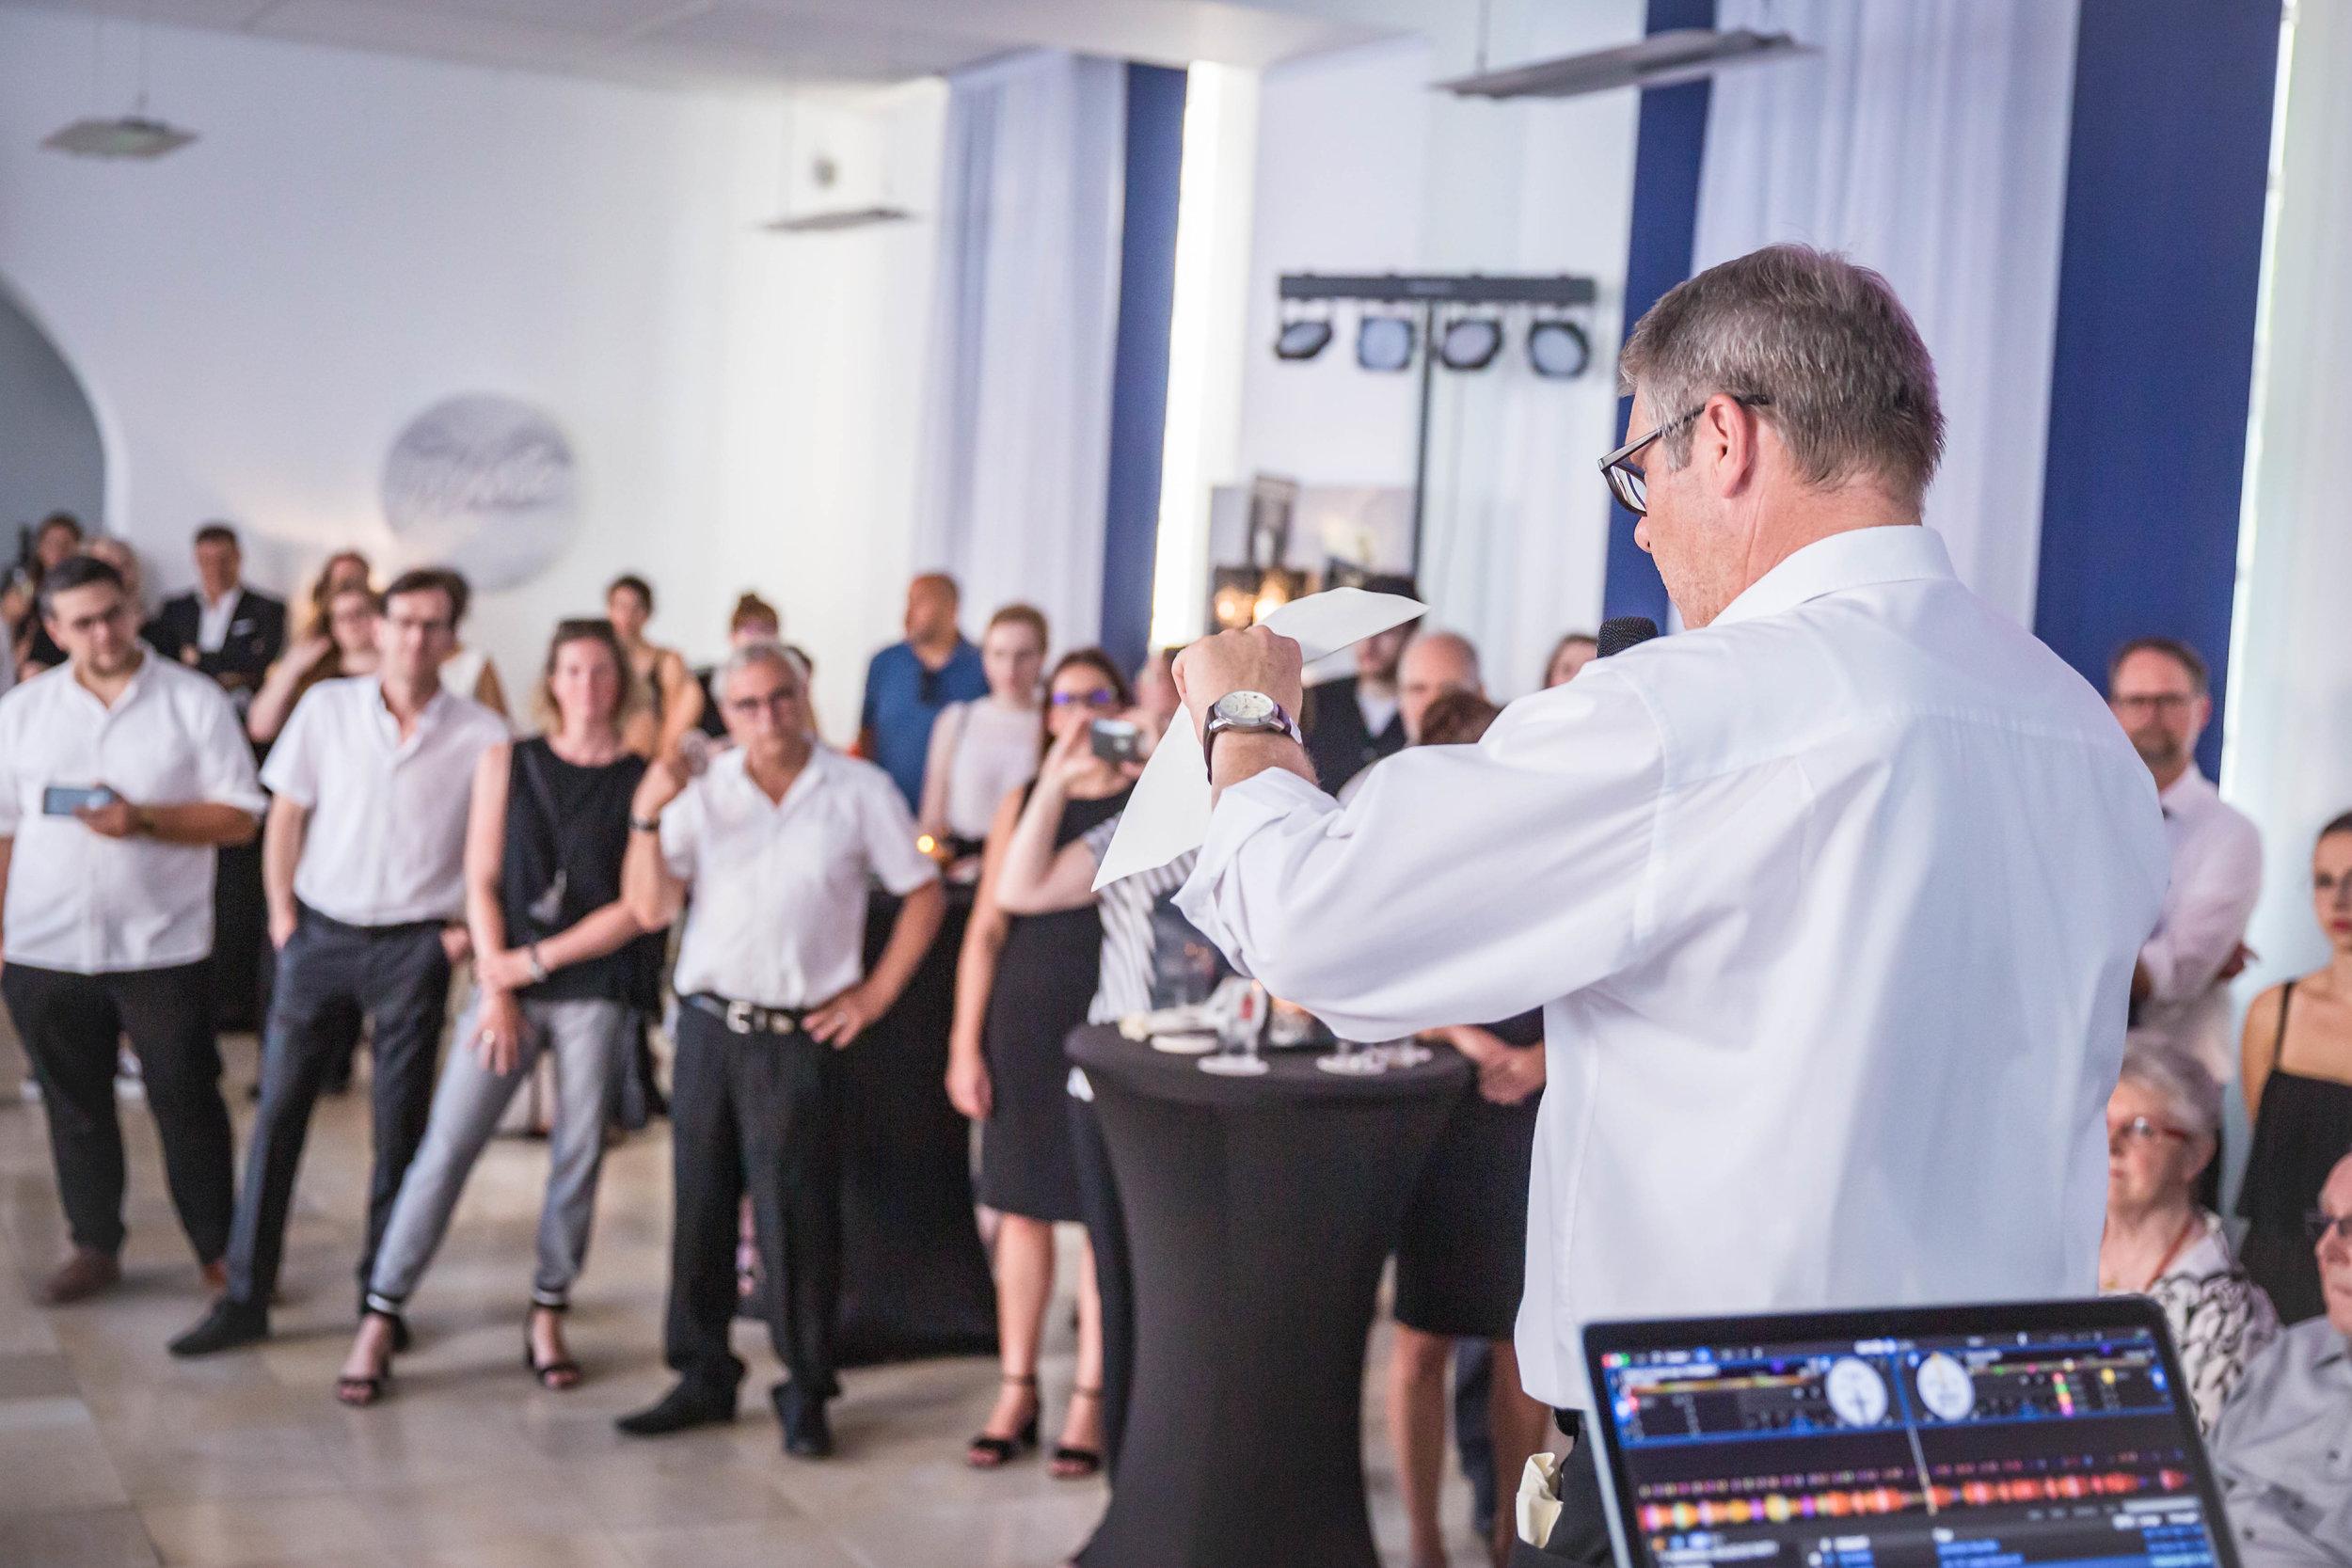 20190626_Akademie_40-jähriges_Jubiläum_FB_kl-5311833.jpg